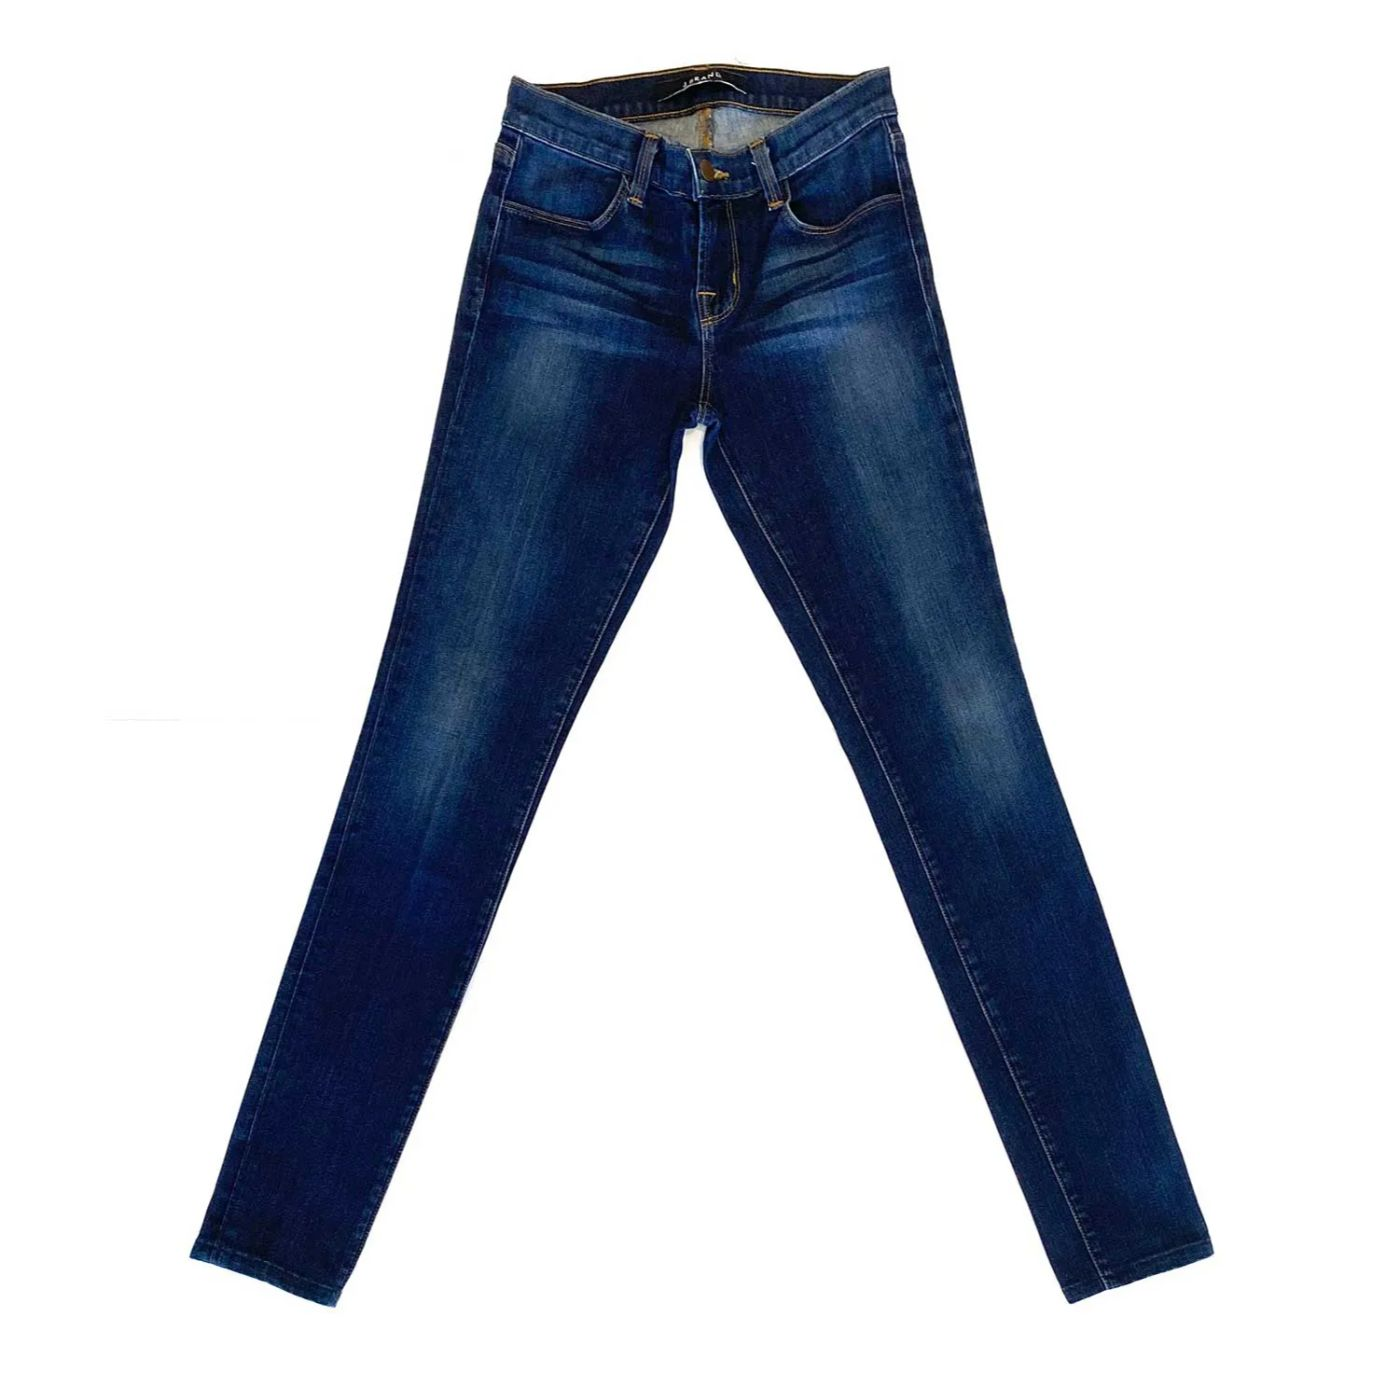 Calça J Brand Skinny Jeans Escuro